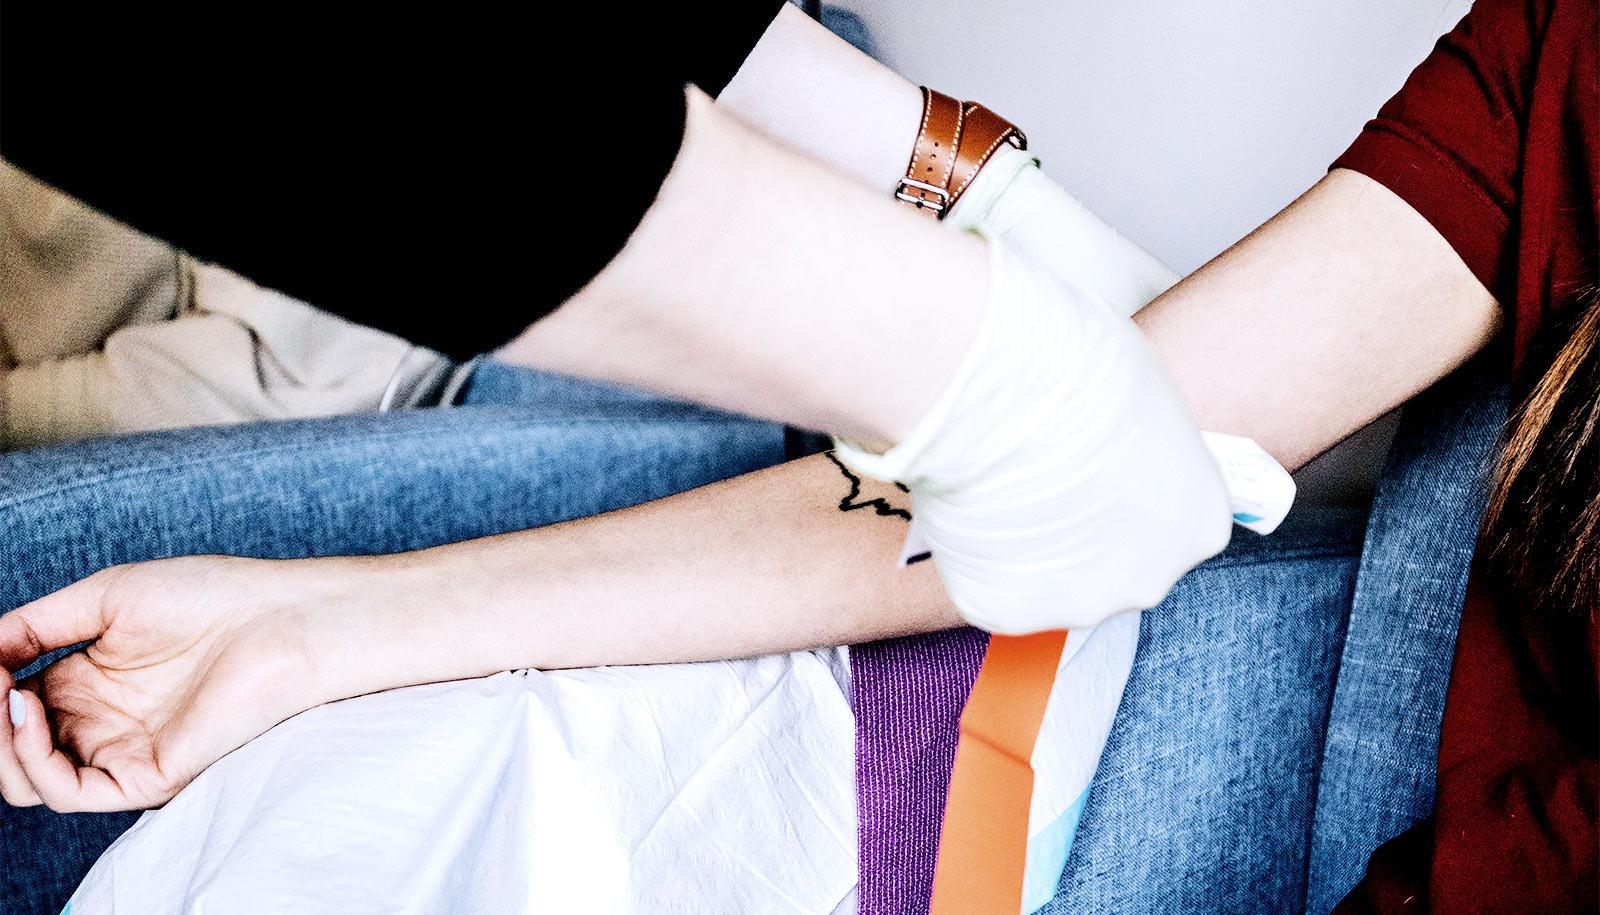 A woman gets a blood test